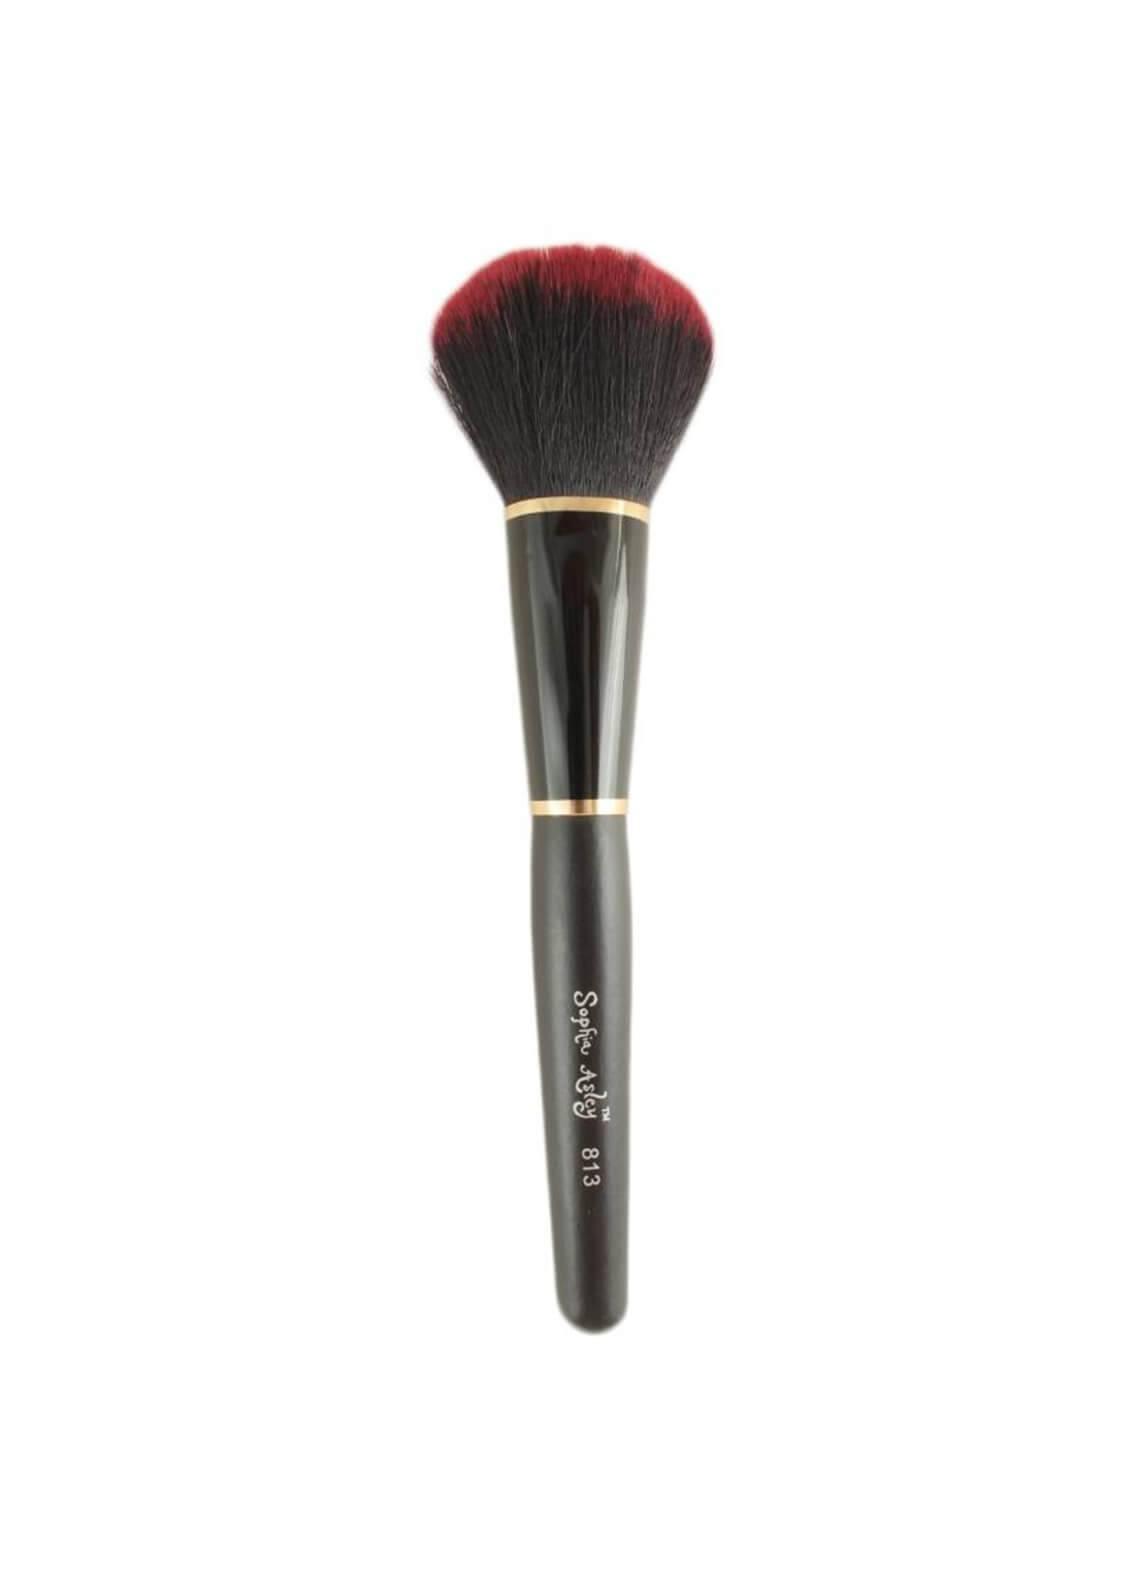 Sophia Asley Professional Blushon Brush